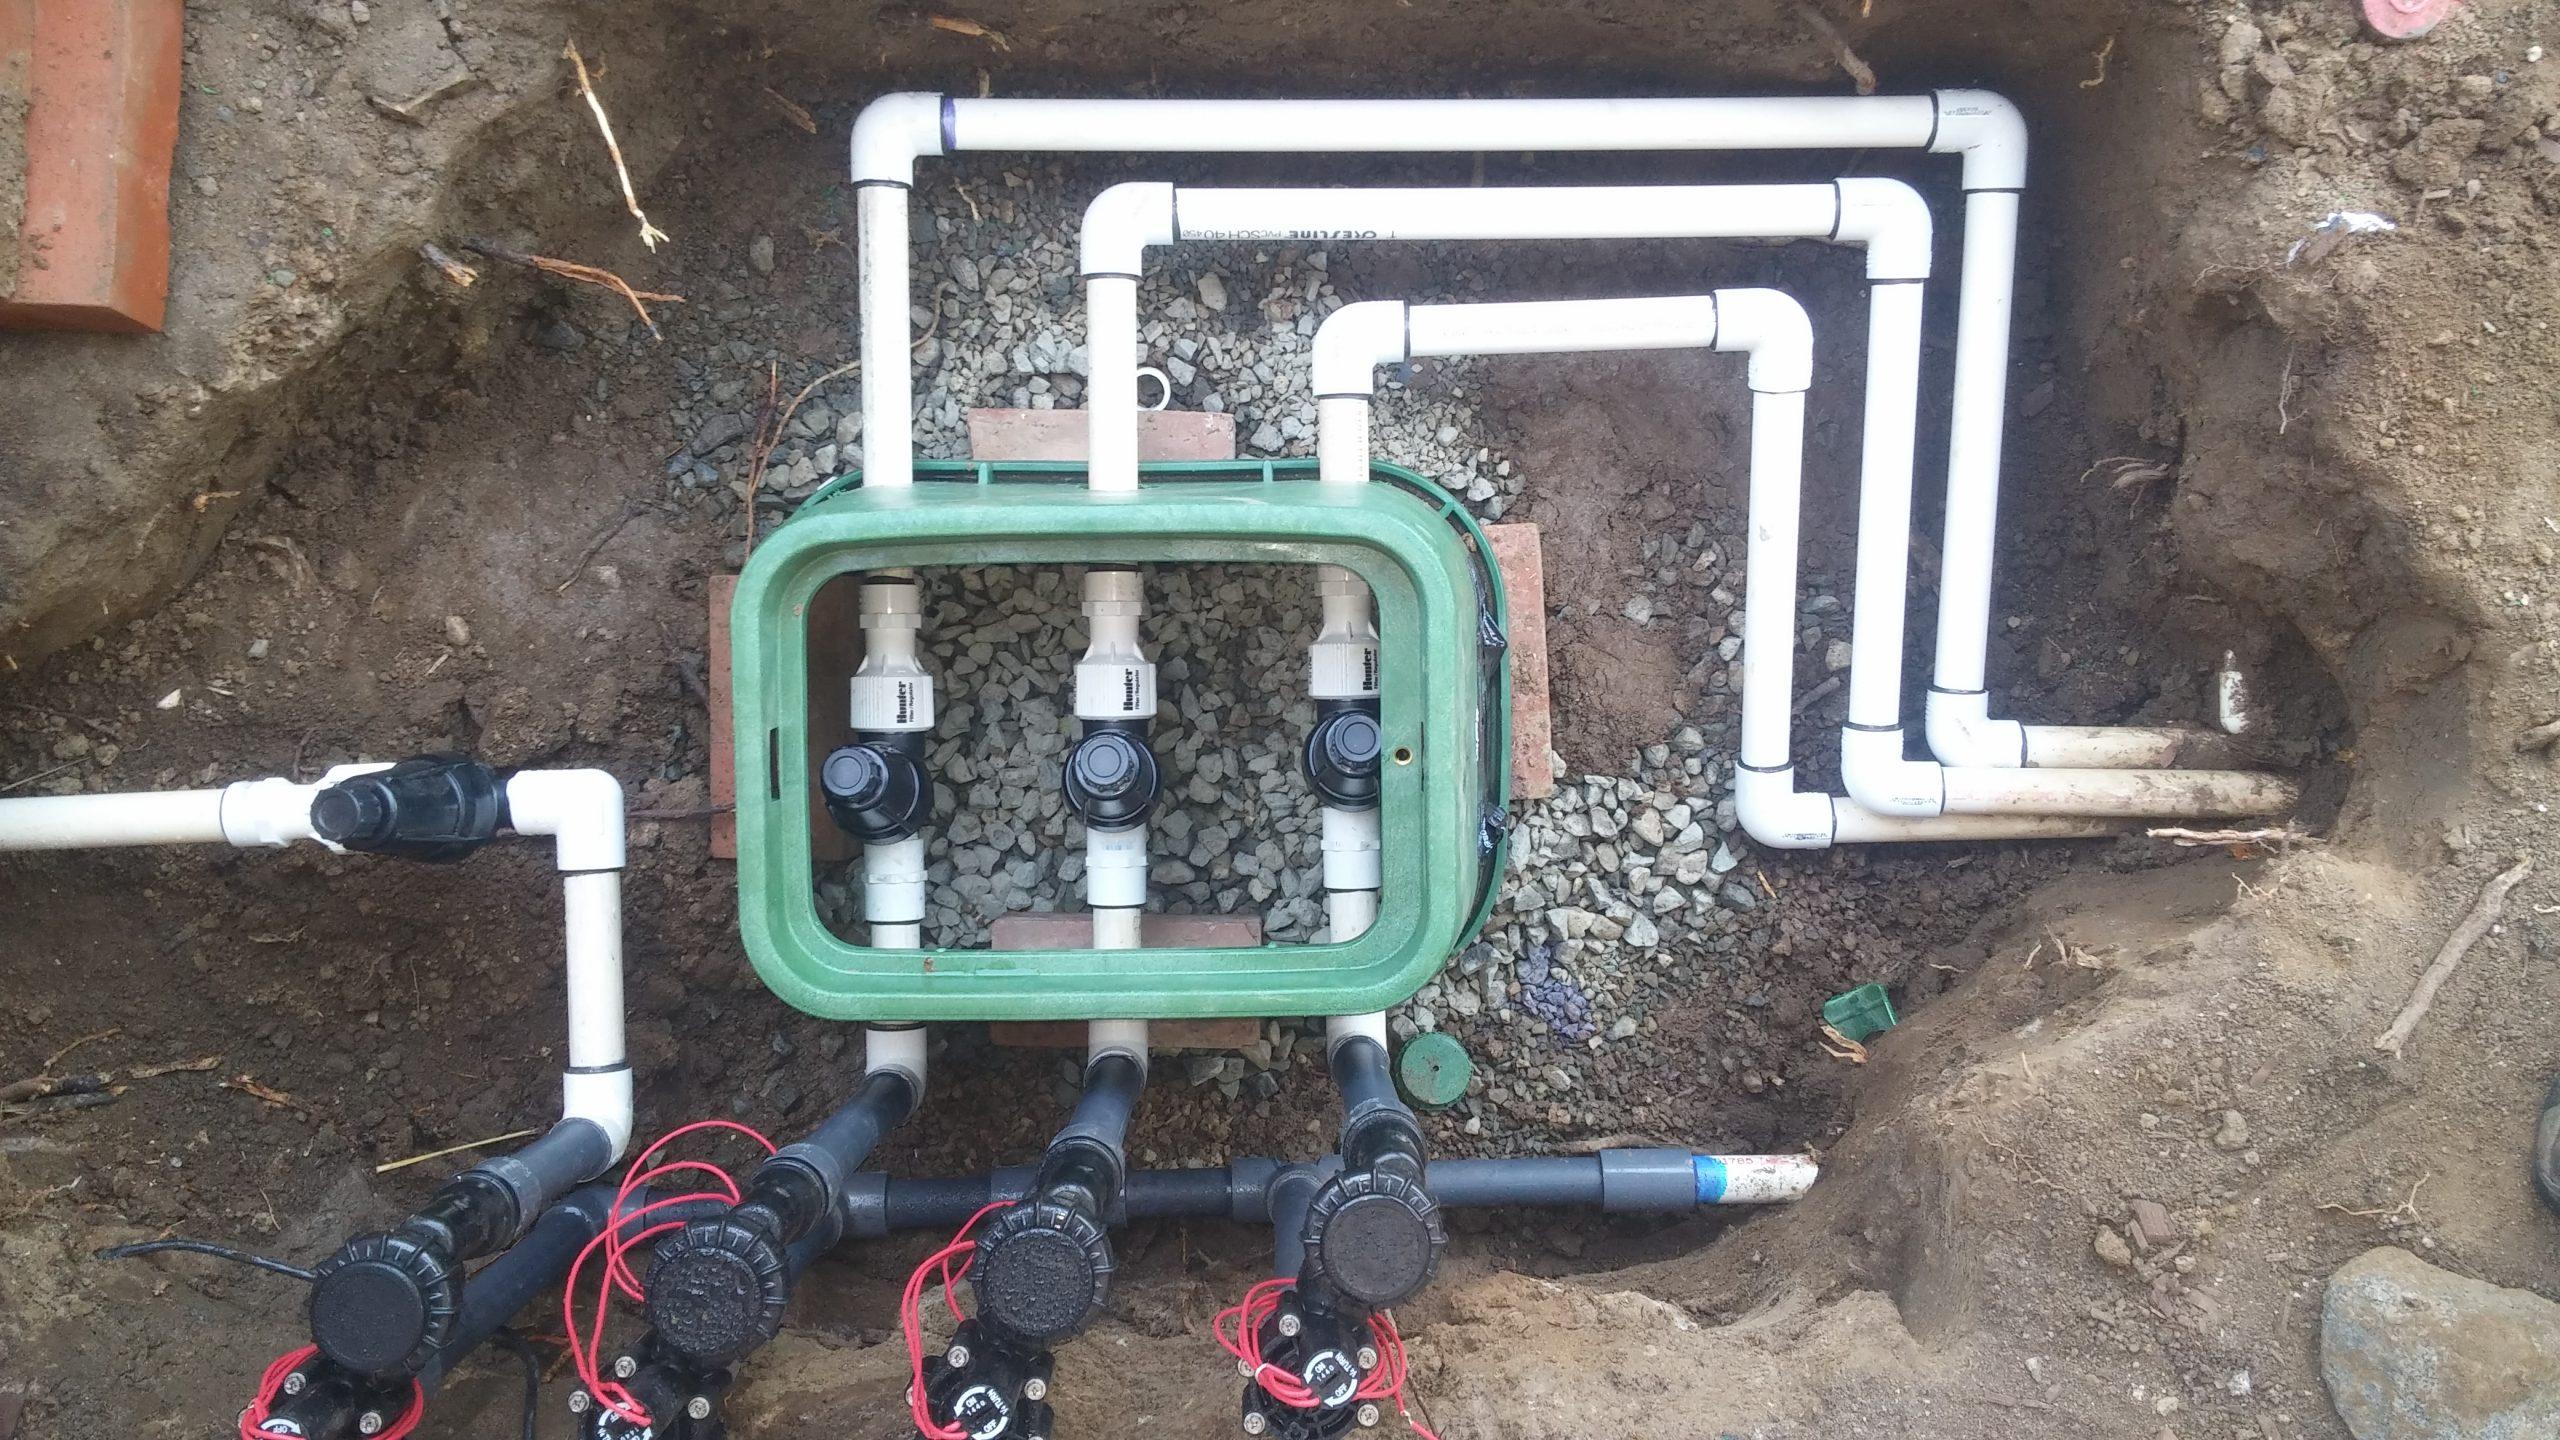 https://irrigationrepairraleigh.com/wp-content/uploads/2020/05/IrrigationManifold2-scaled.jpg